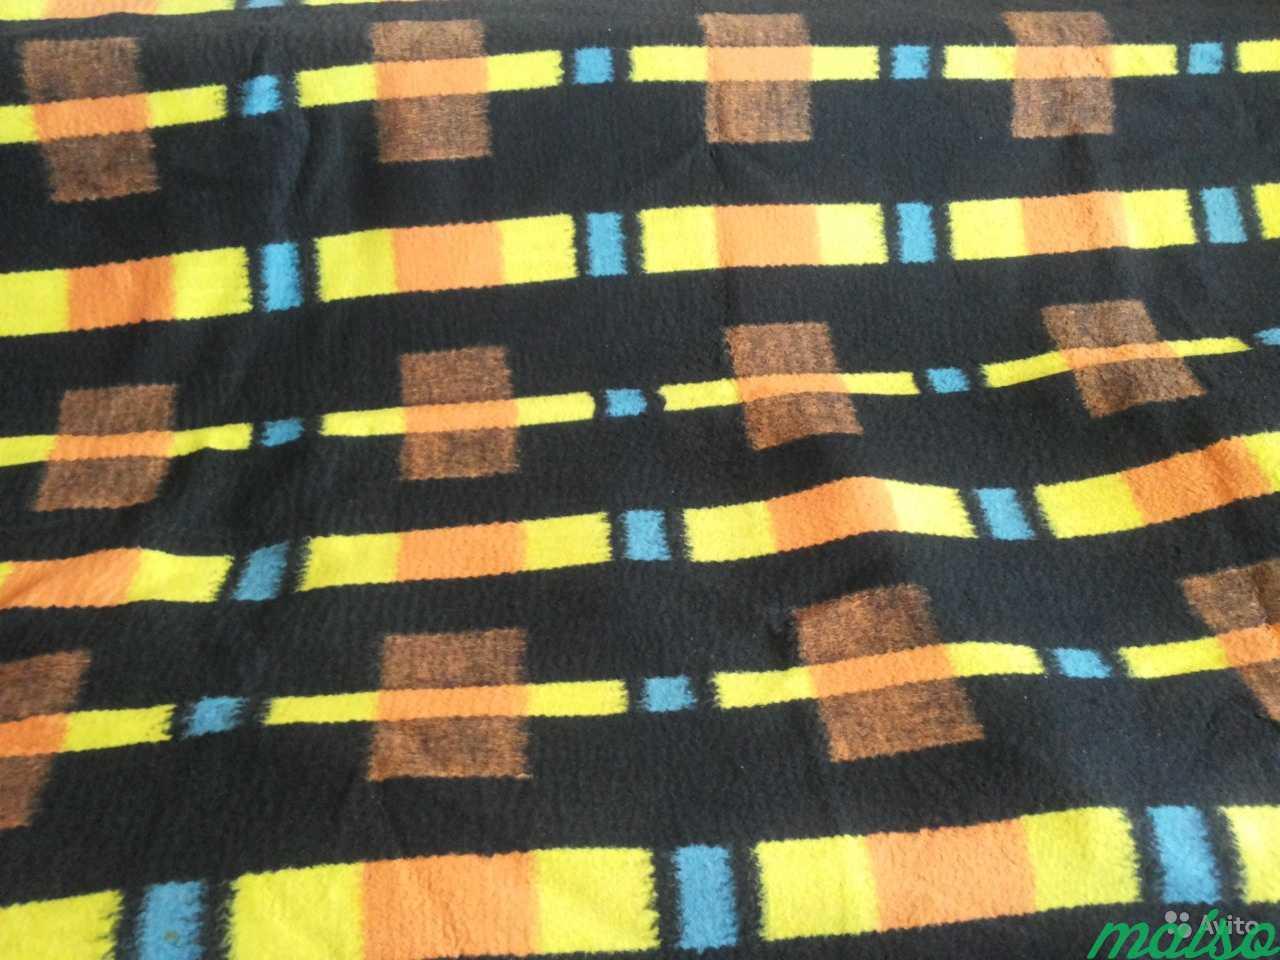 Плед одеяло шерстяной 2 шт в Москве. Фото 3